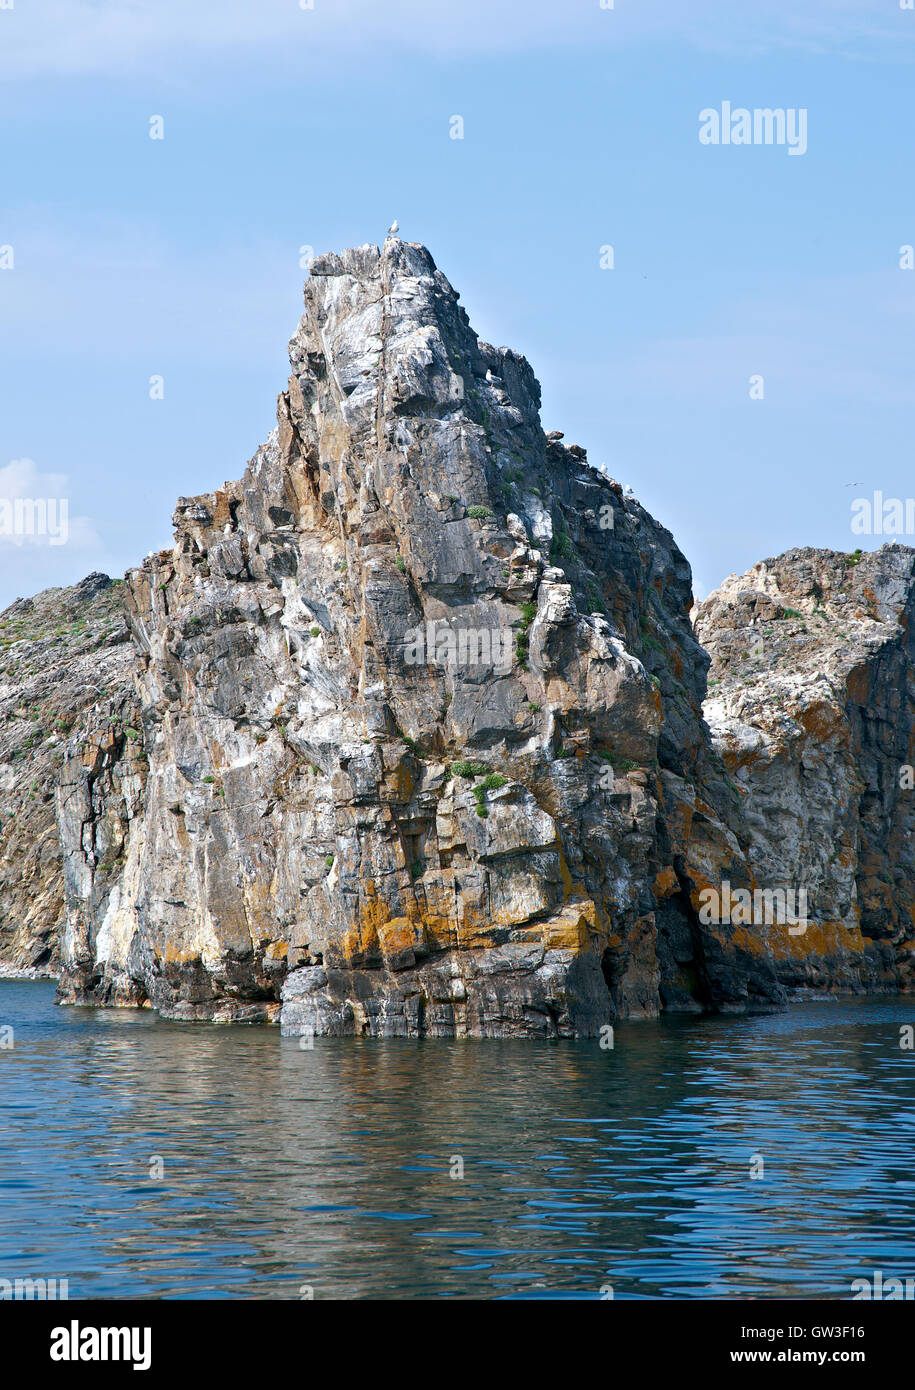 ocky cliff on the shore , Olkhon island, lake Baikal, Siberia, Russia - Stock Image